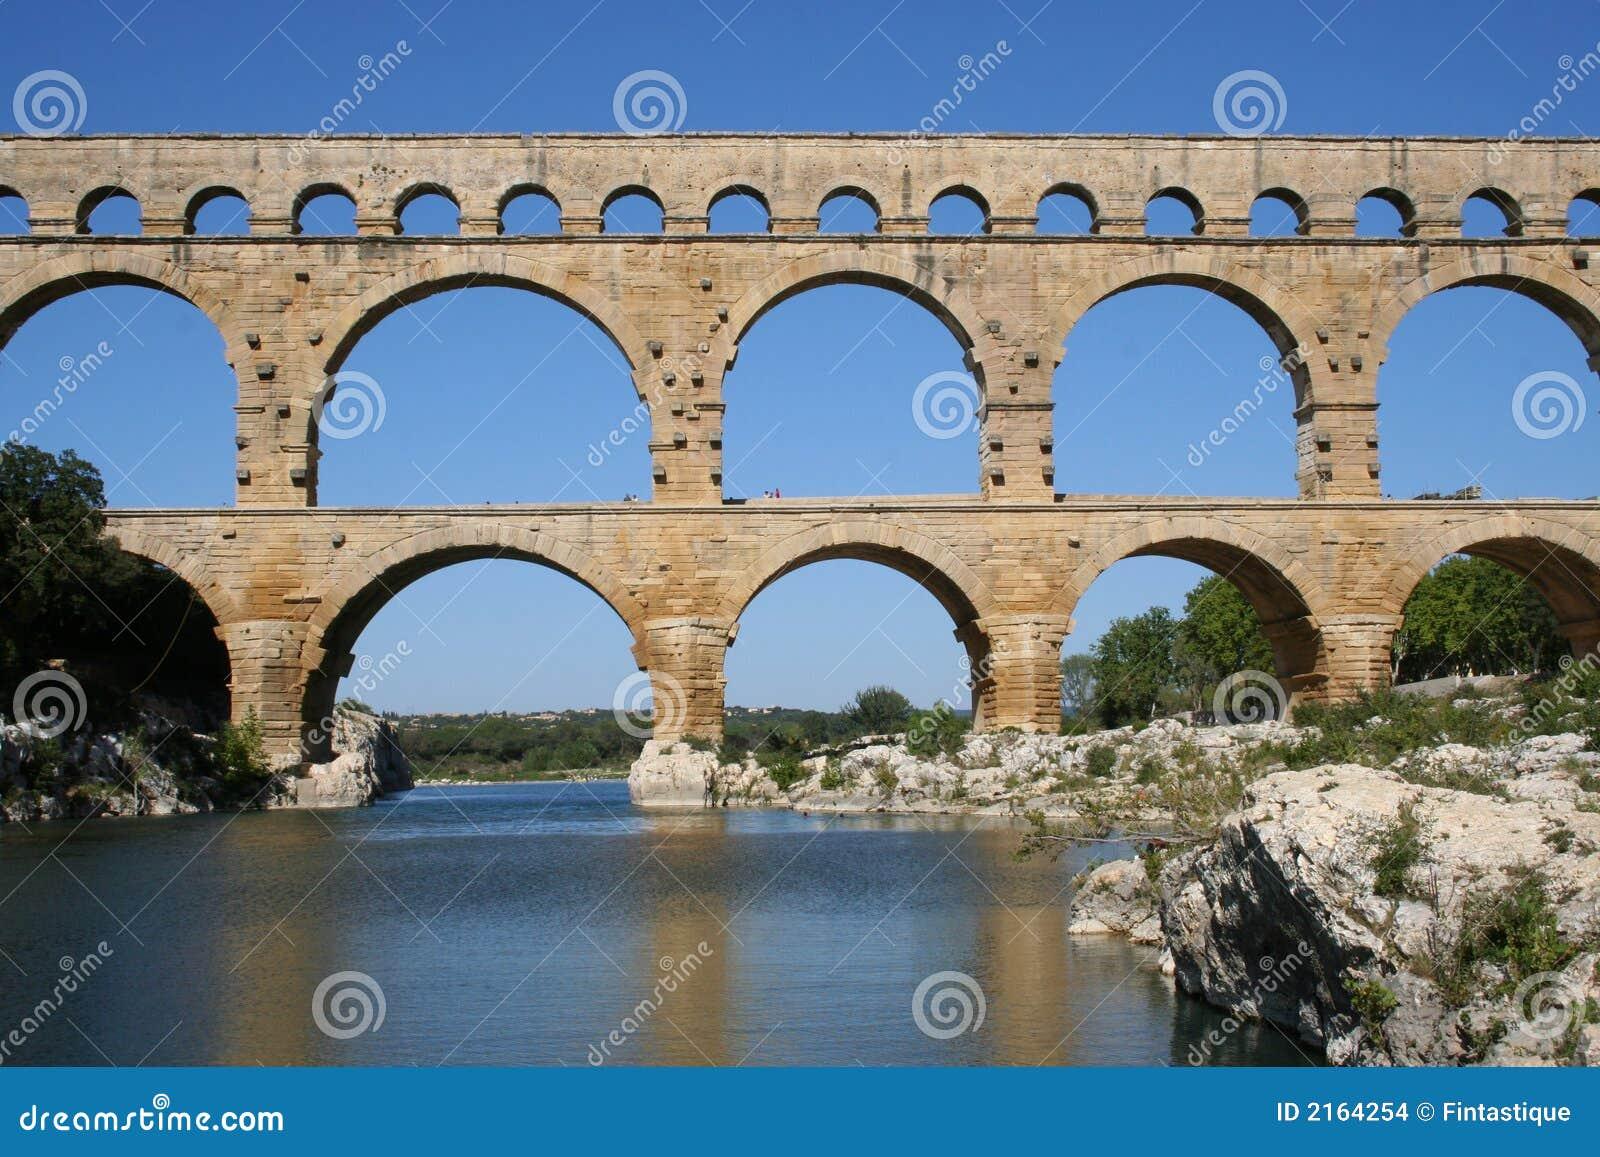 Pont för akveduktdu gard